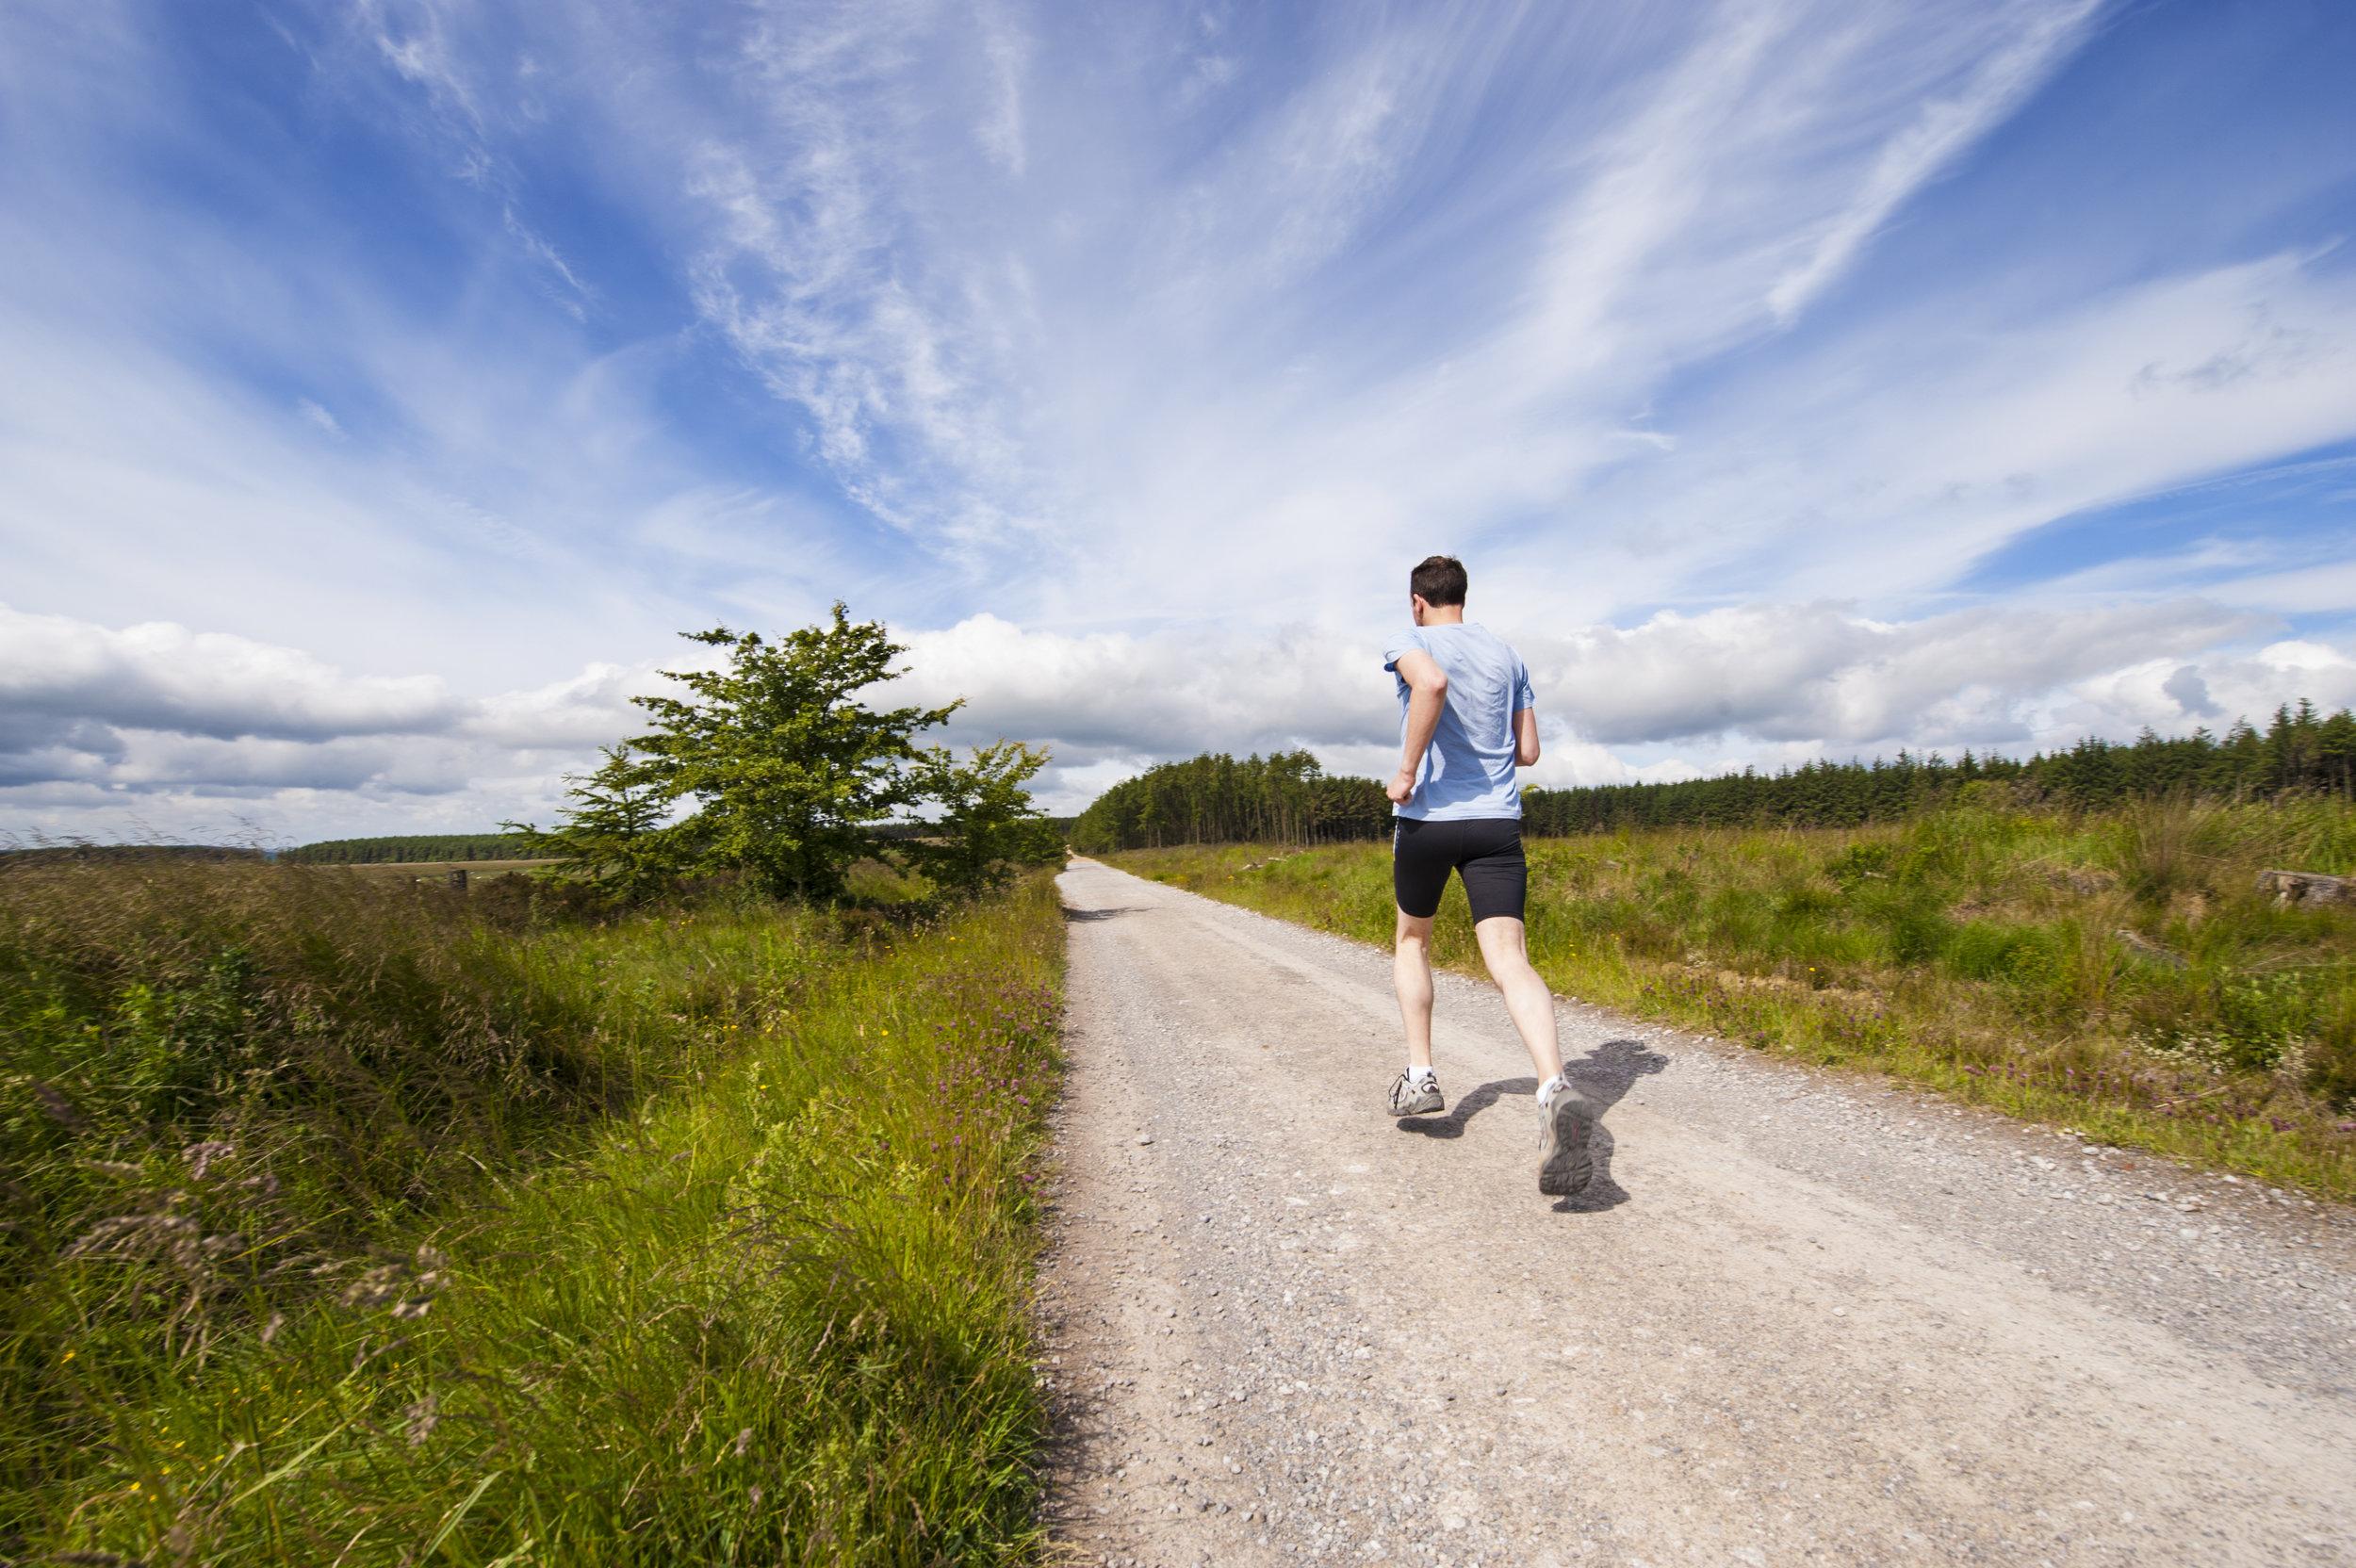 10.30 – 11.30 - Ox Drove Run